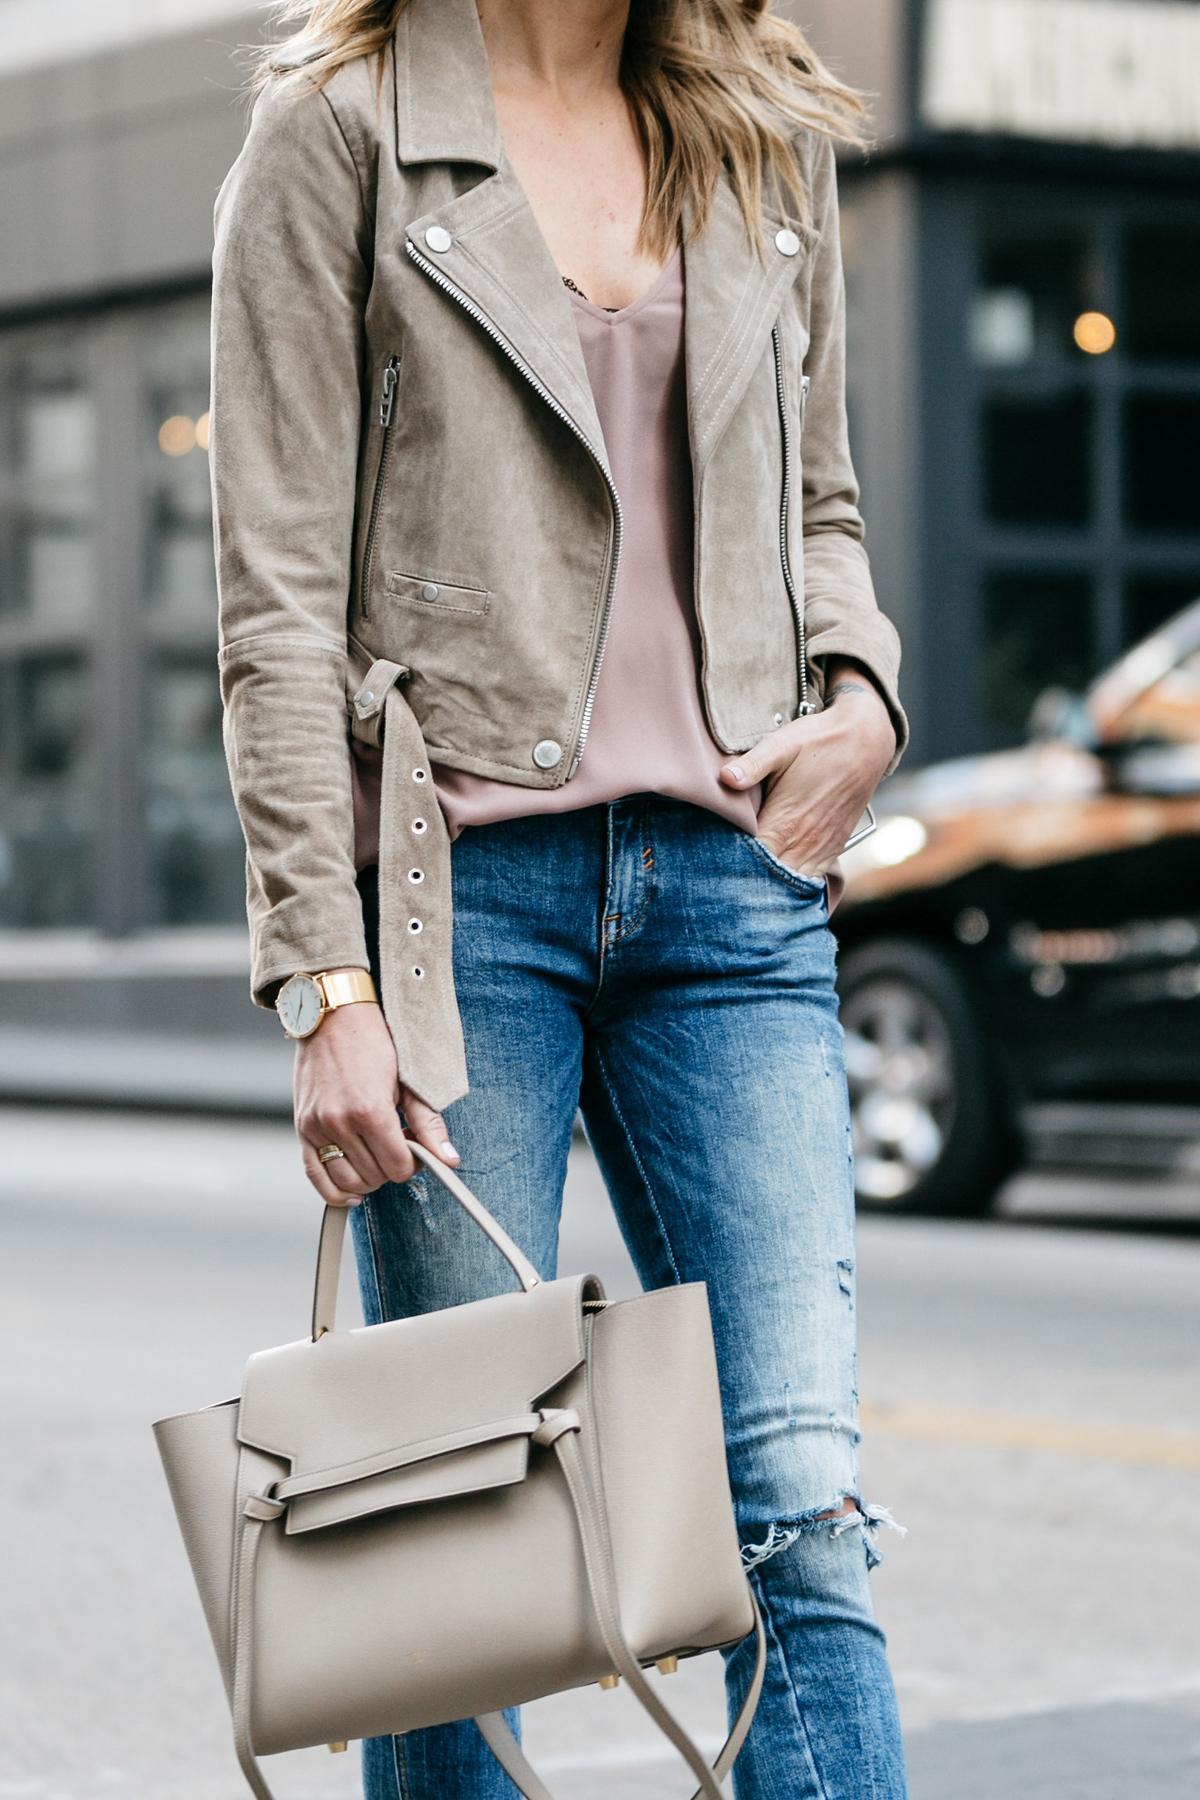 Fashion Jackson, Street Style, Blanknyc Tan Suede Moto Jacket, Blush Cami, Denim Ripped Skinny Jeans